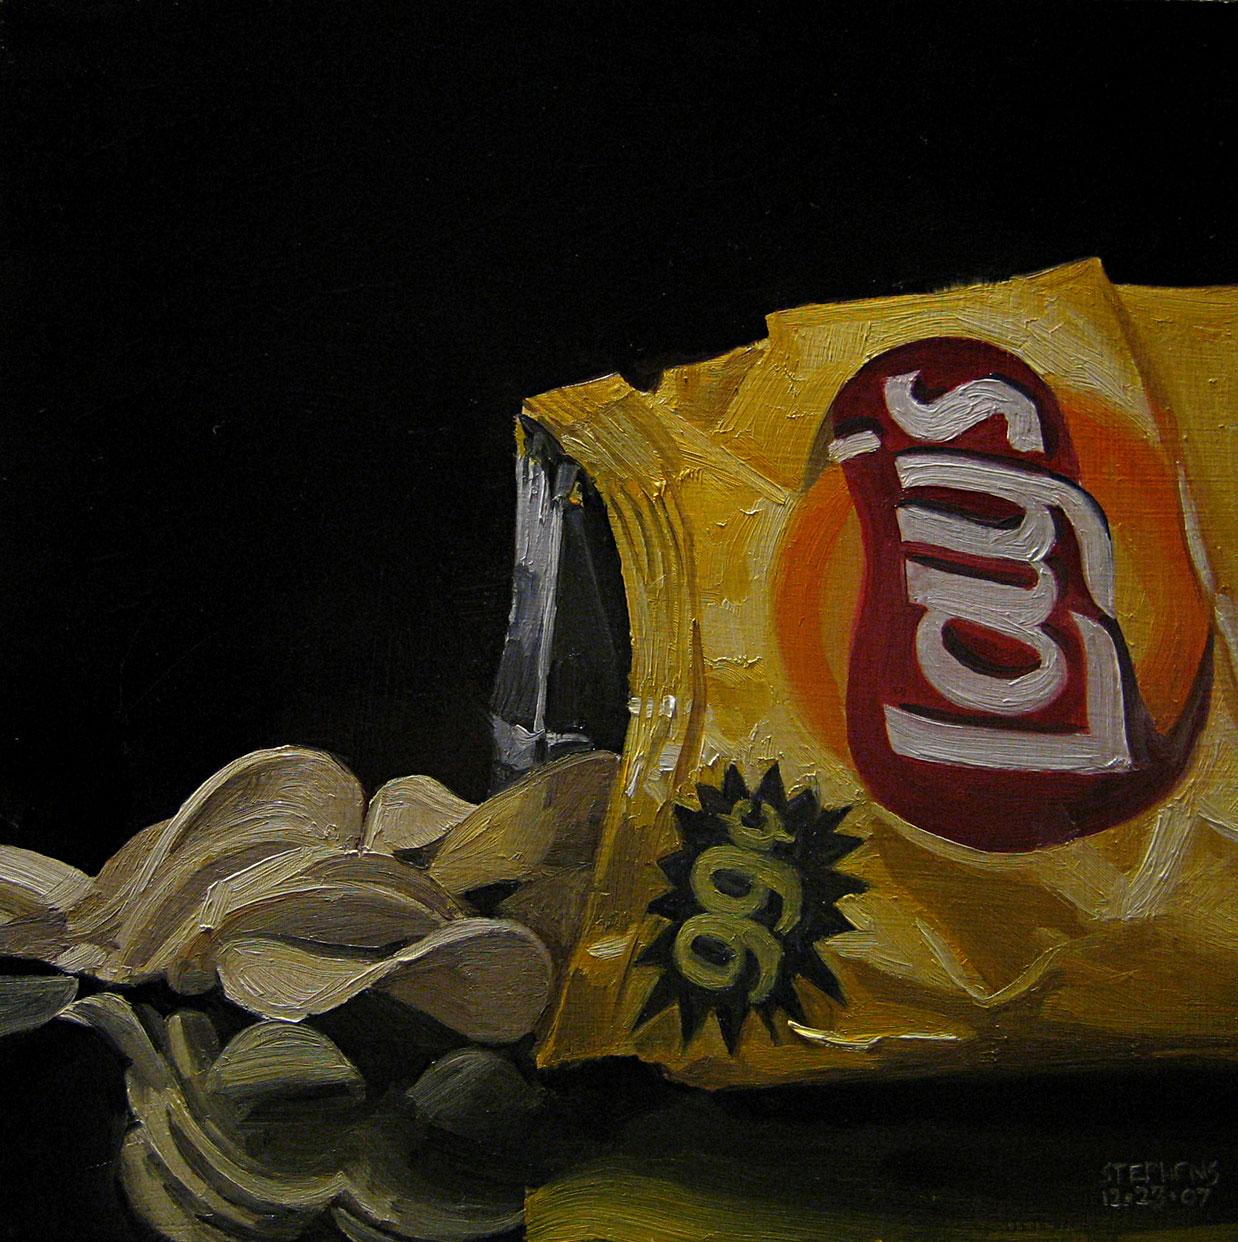 Chips Plaatje 187 Animaatjes Nl